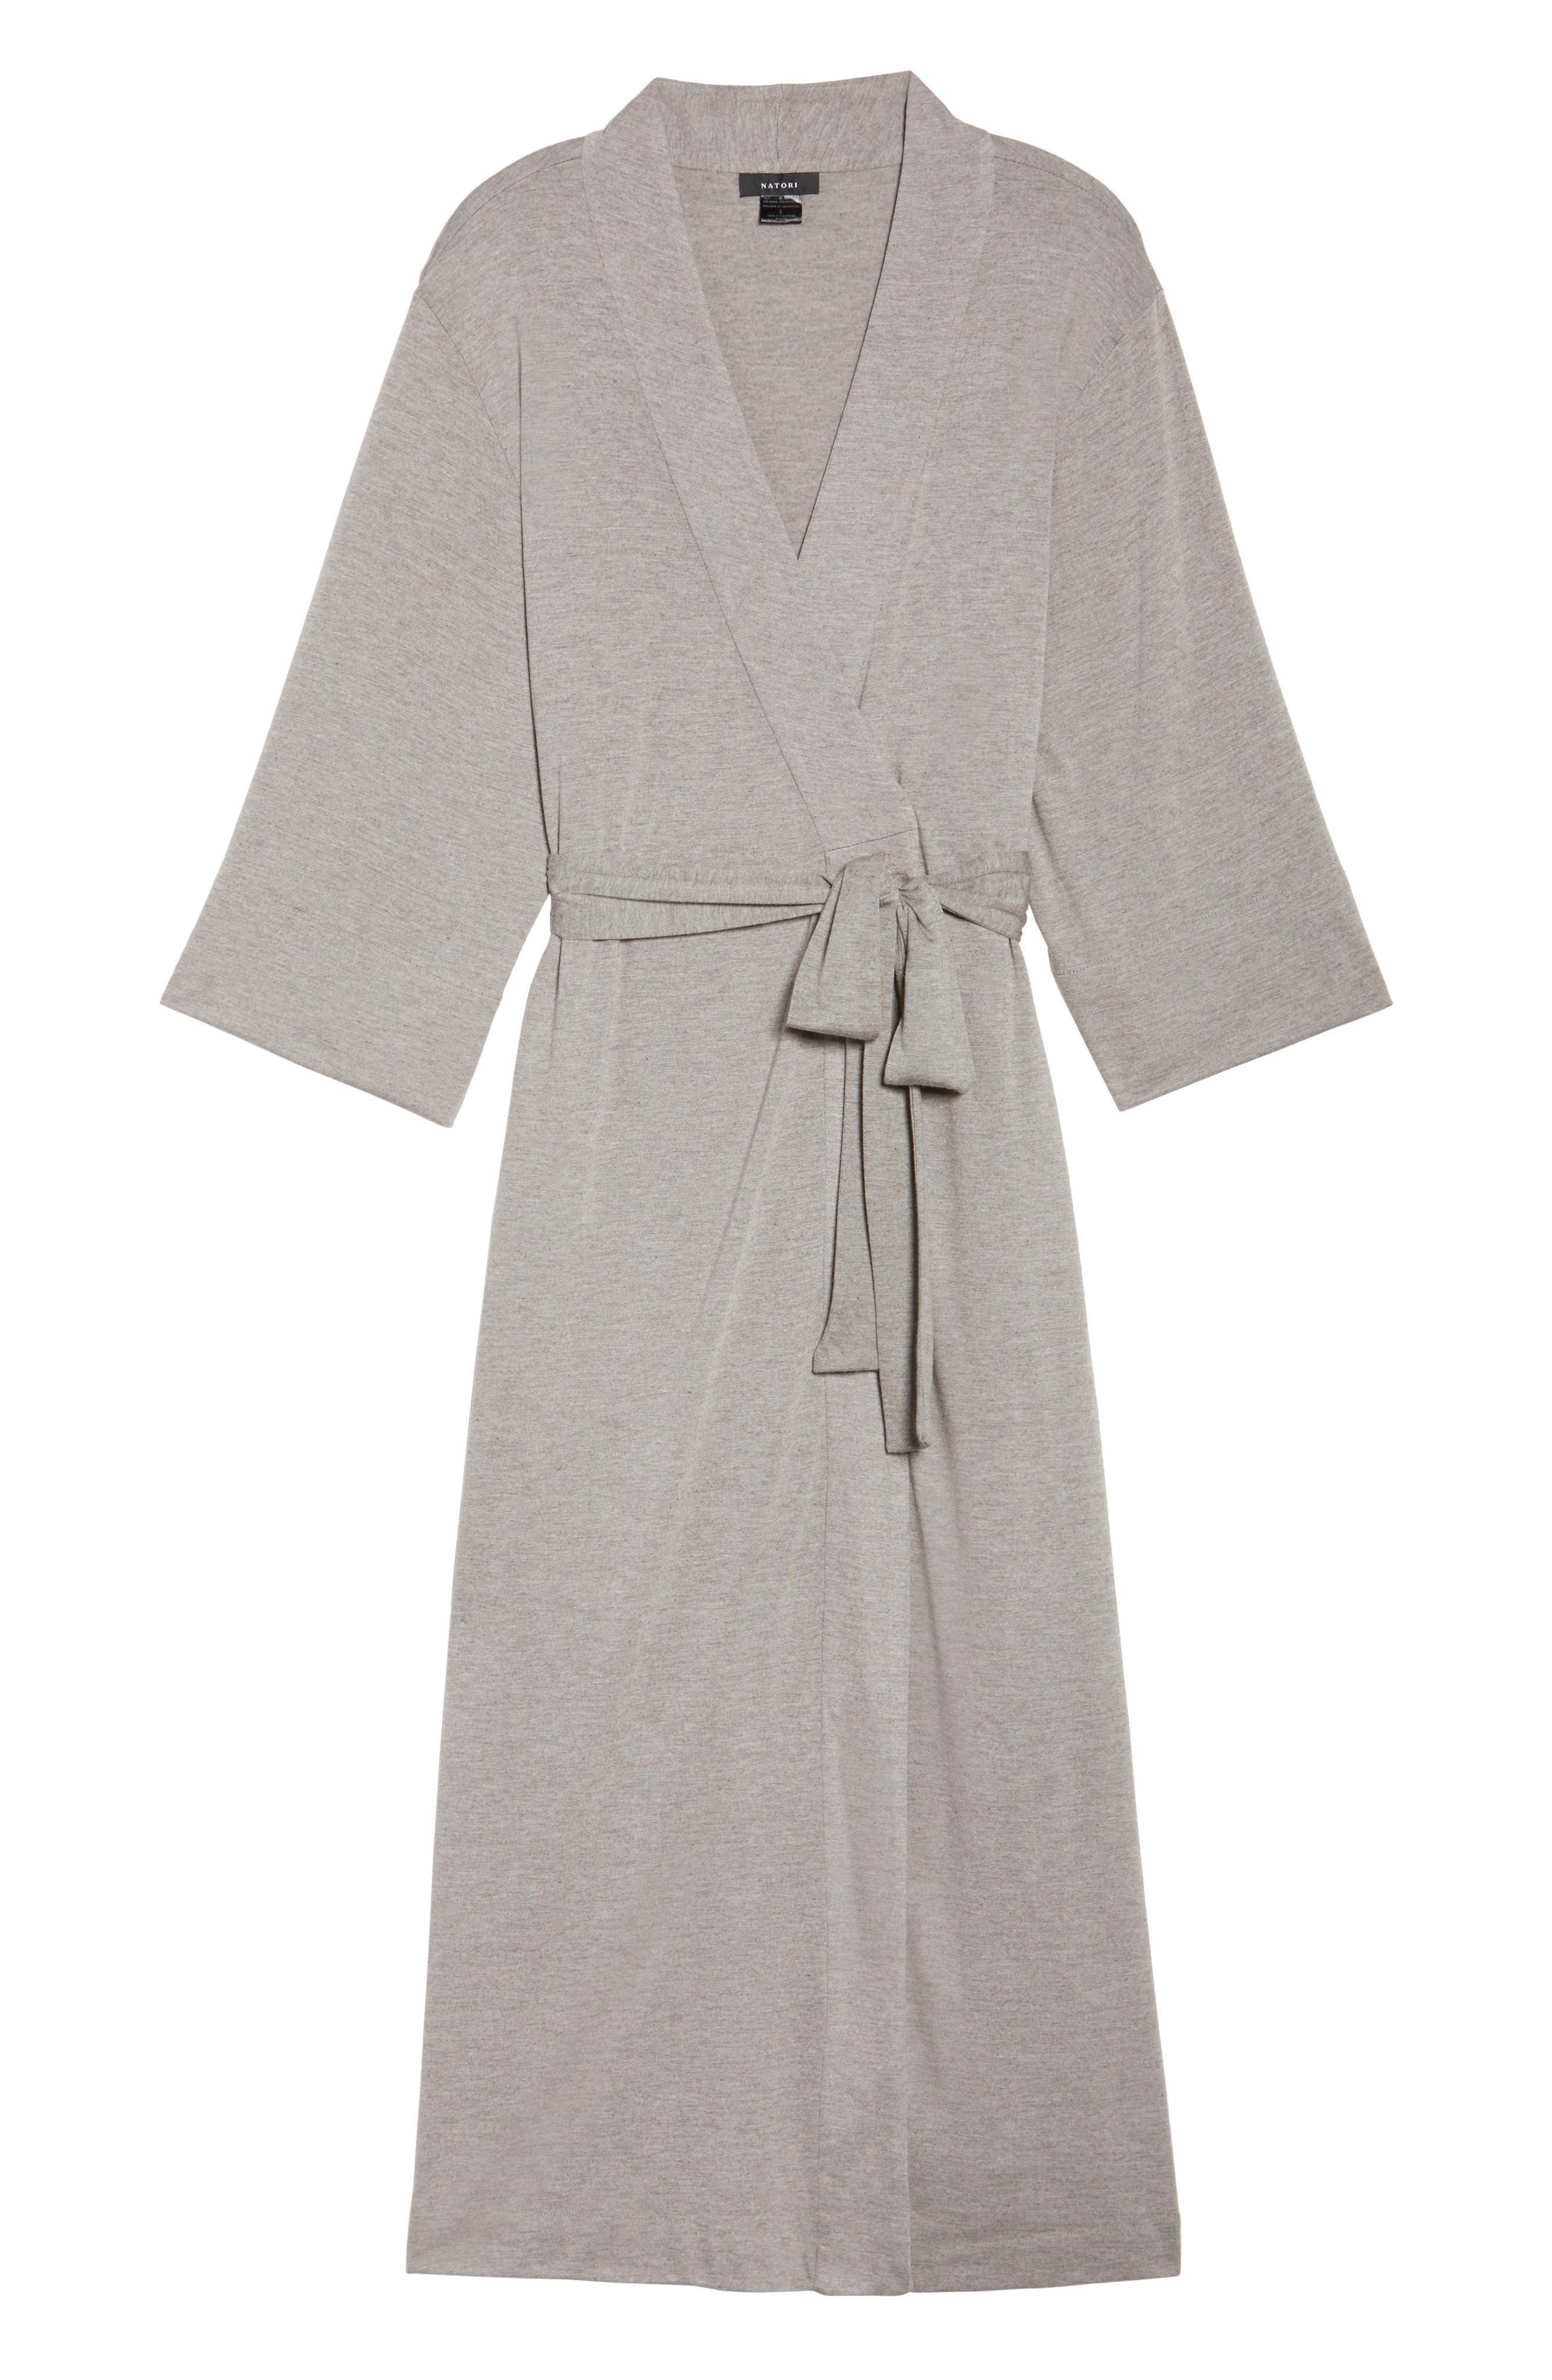 'Shangri-La' Robe,                             Alternate thumbnail 6, color,                             250